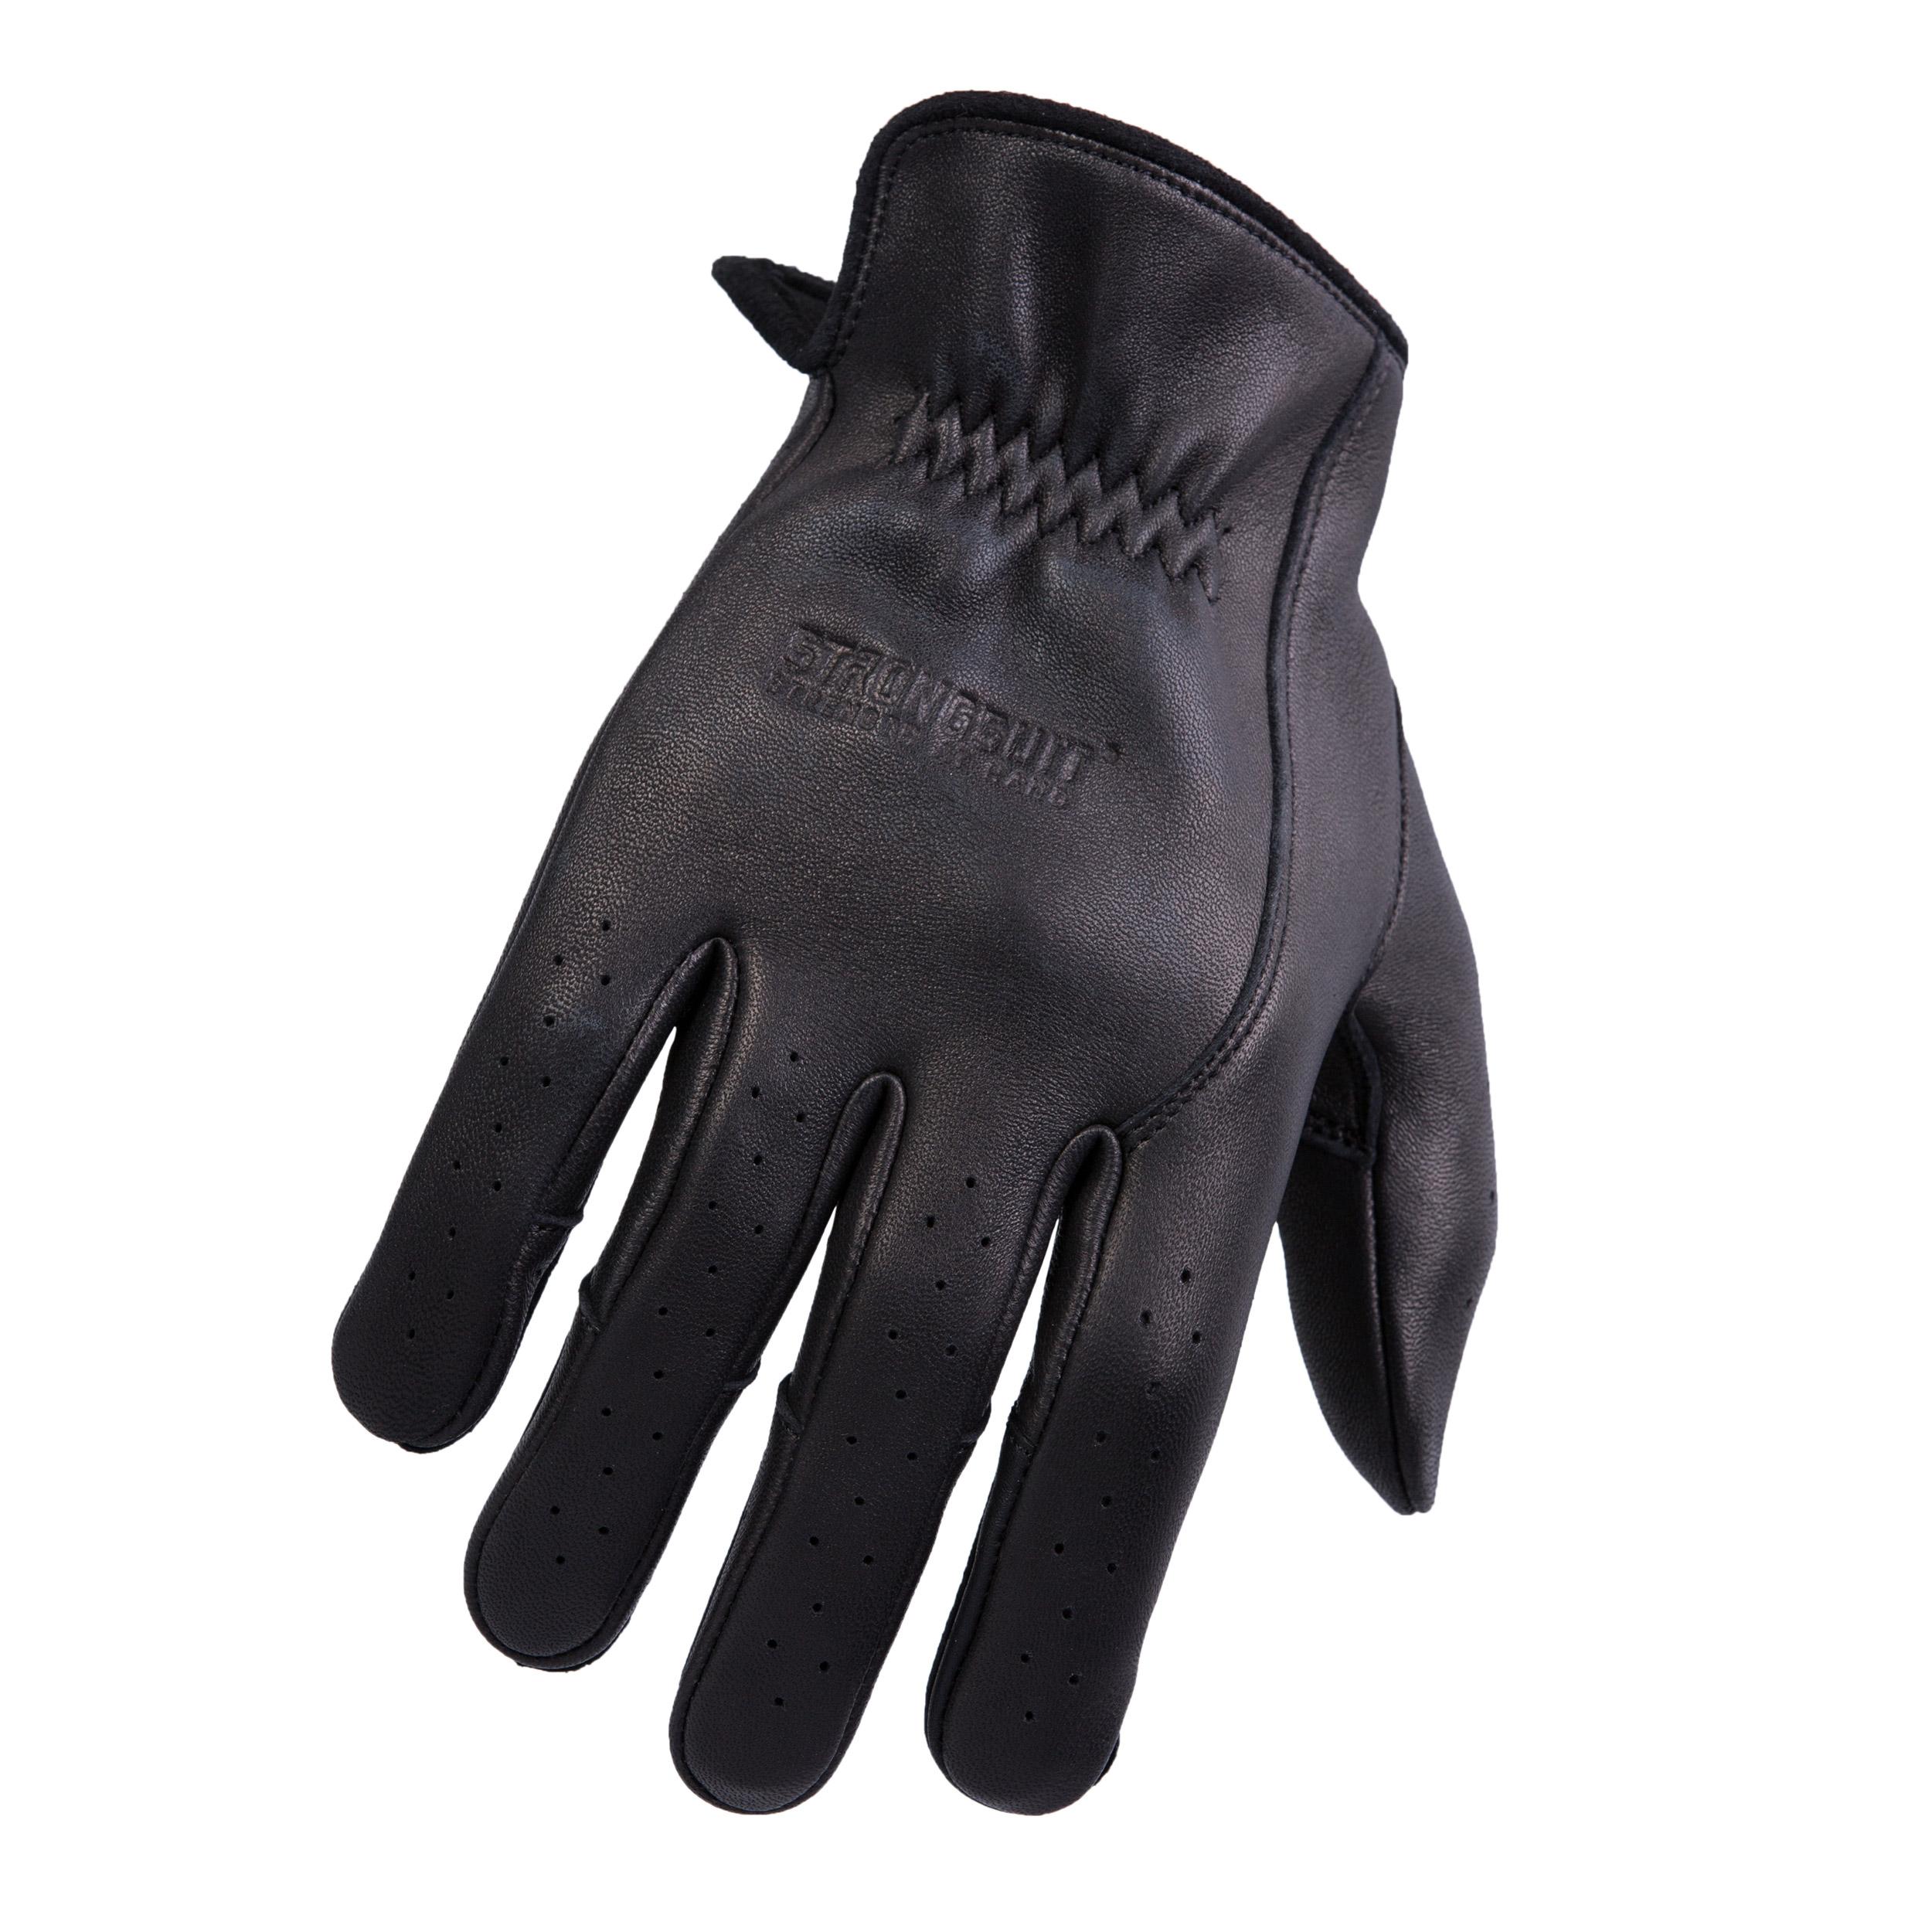 Essence Gloves, Black, Small